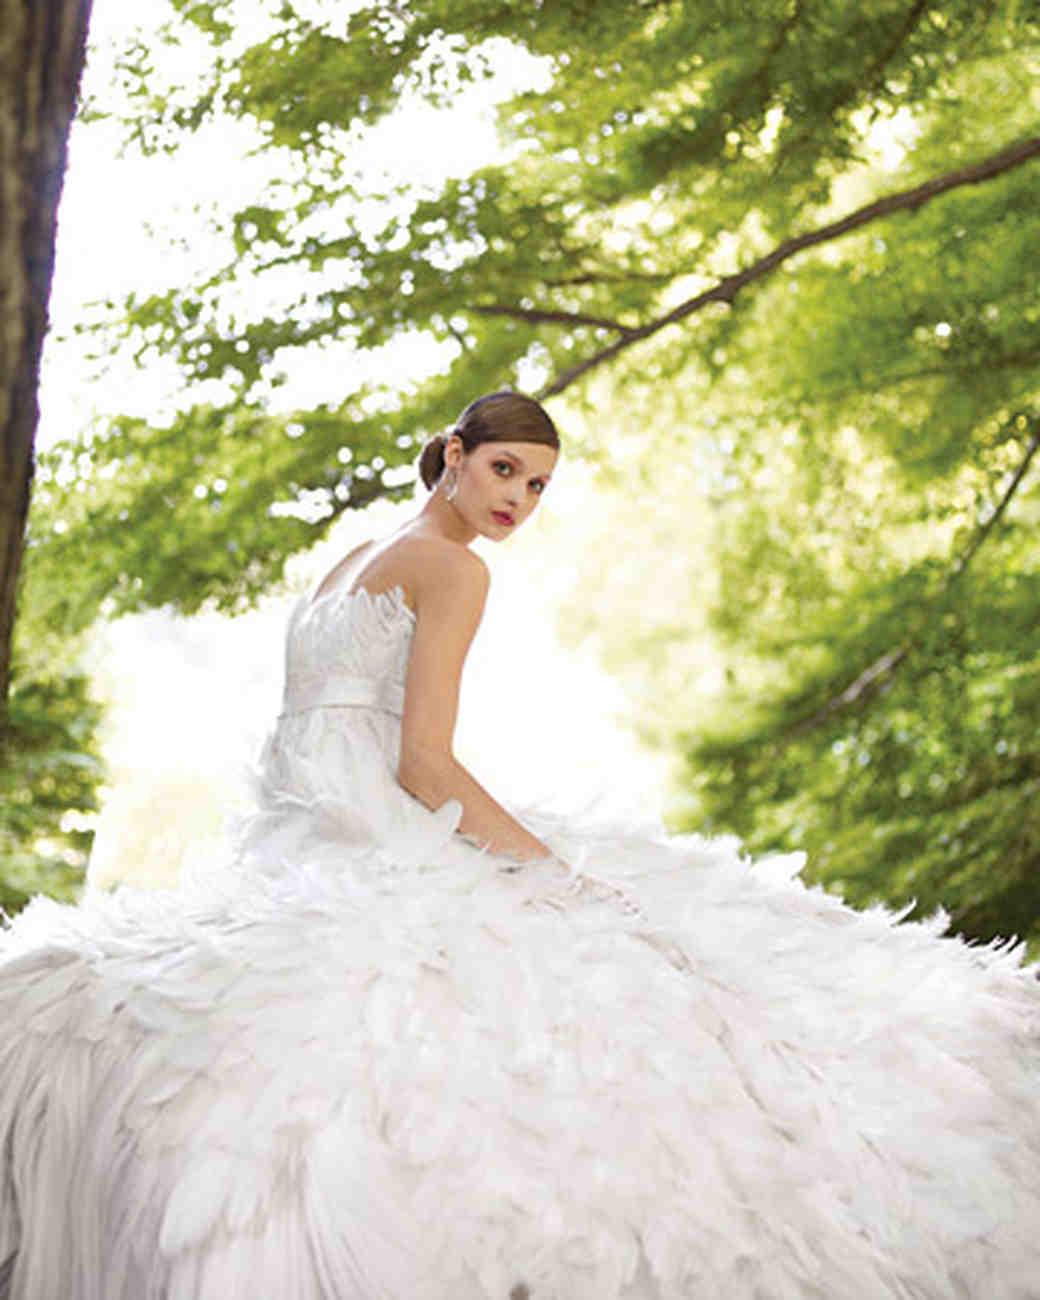 Outdoor Wedding Gowns